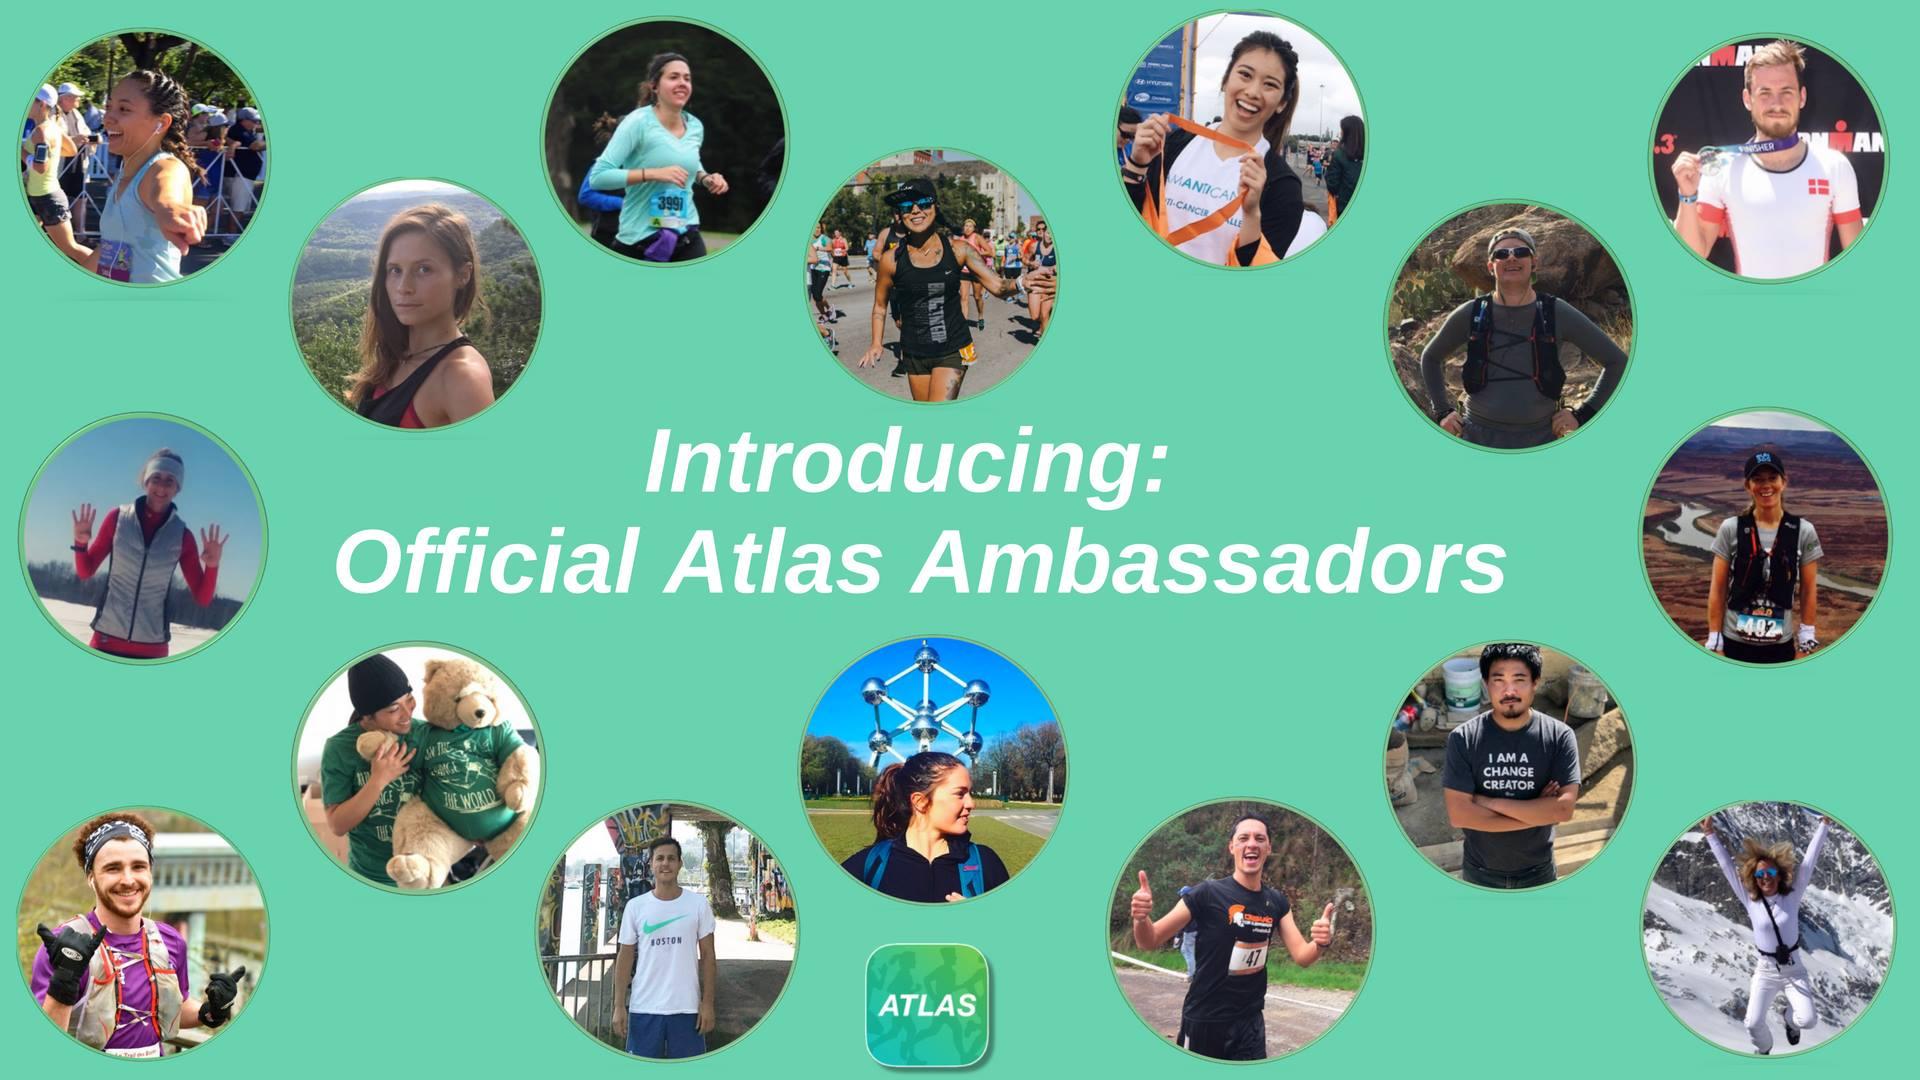 Meet atlasGO Ambassadors: Luca Di Gregorio